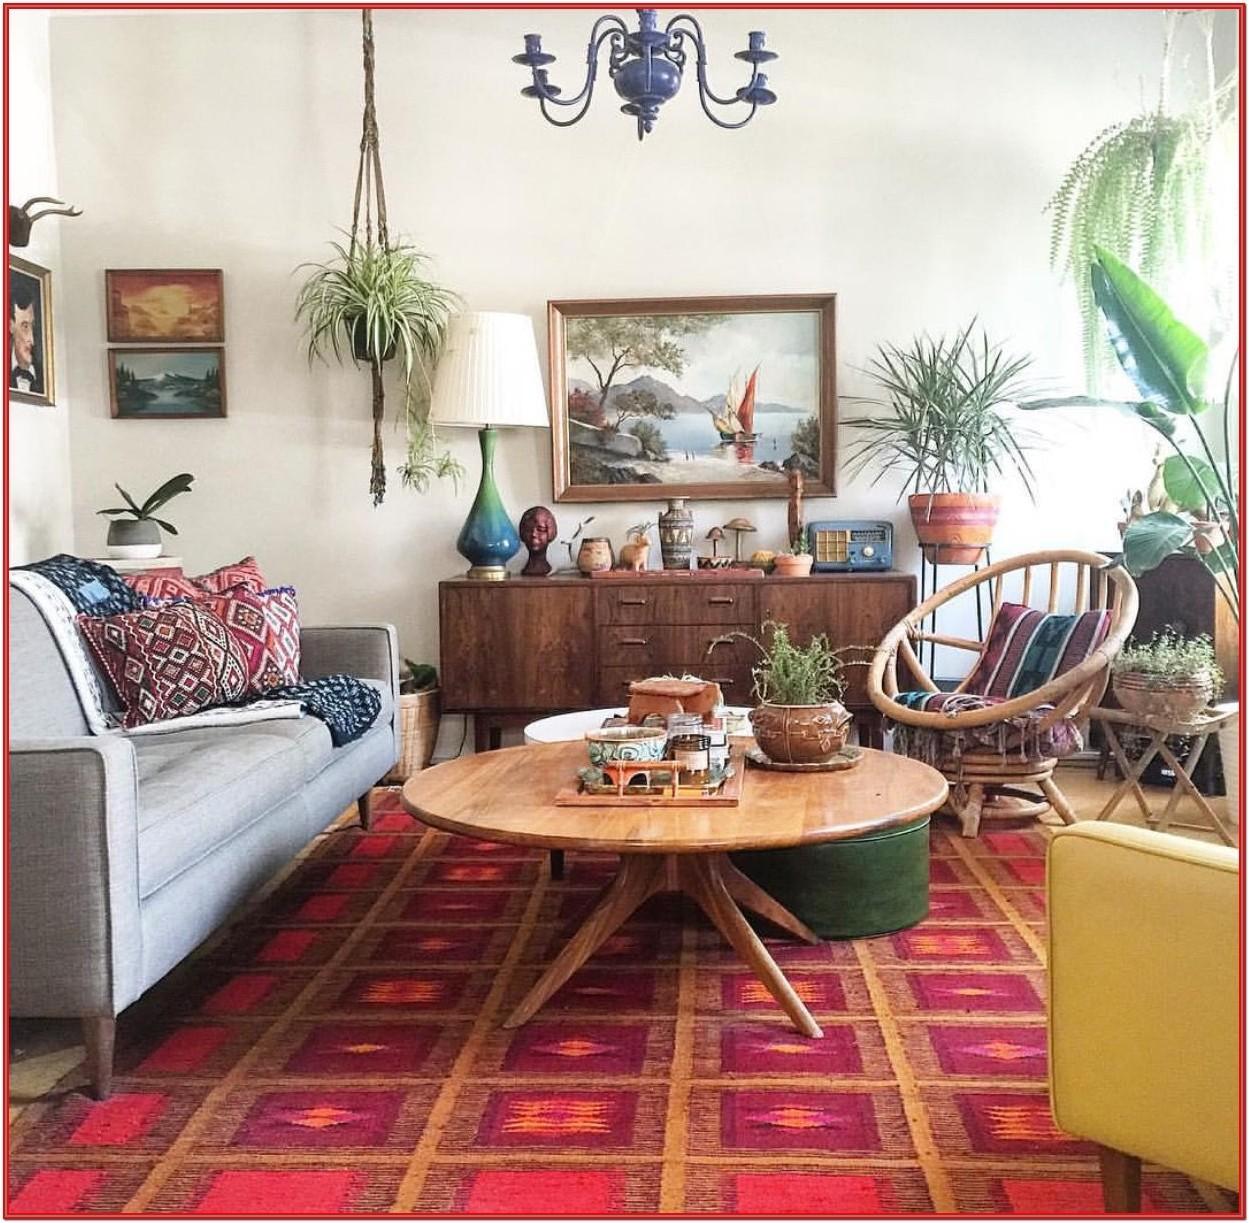 Living Room Interior Design Ideas With Plants